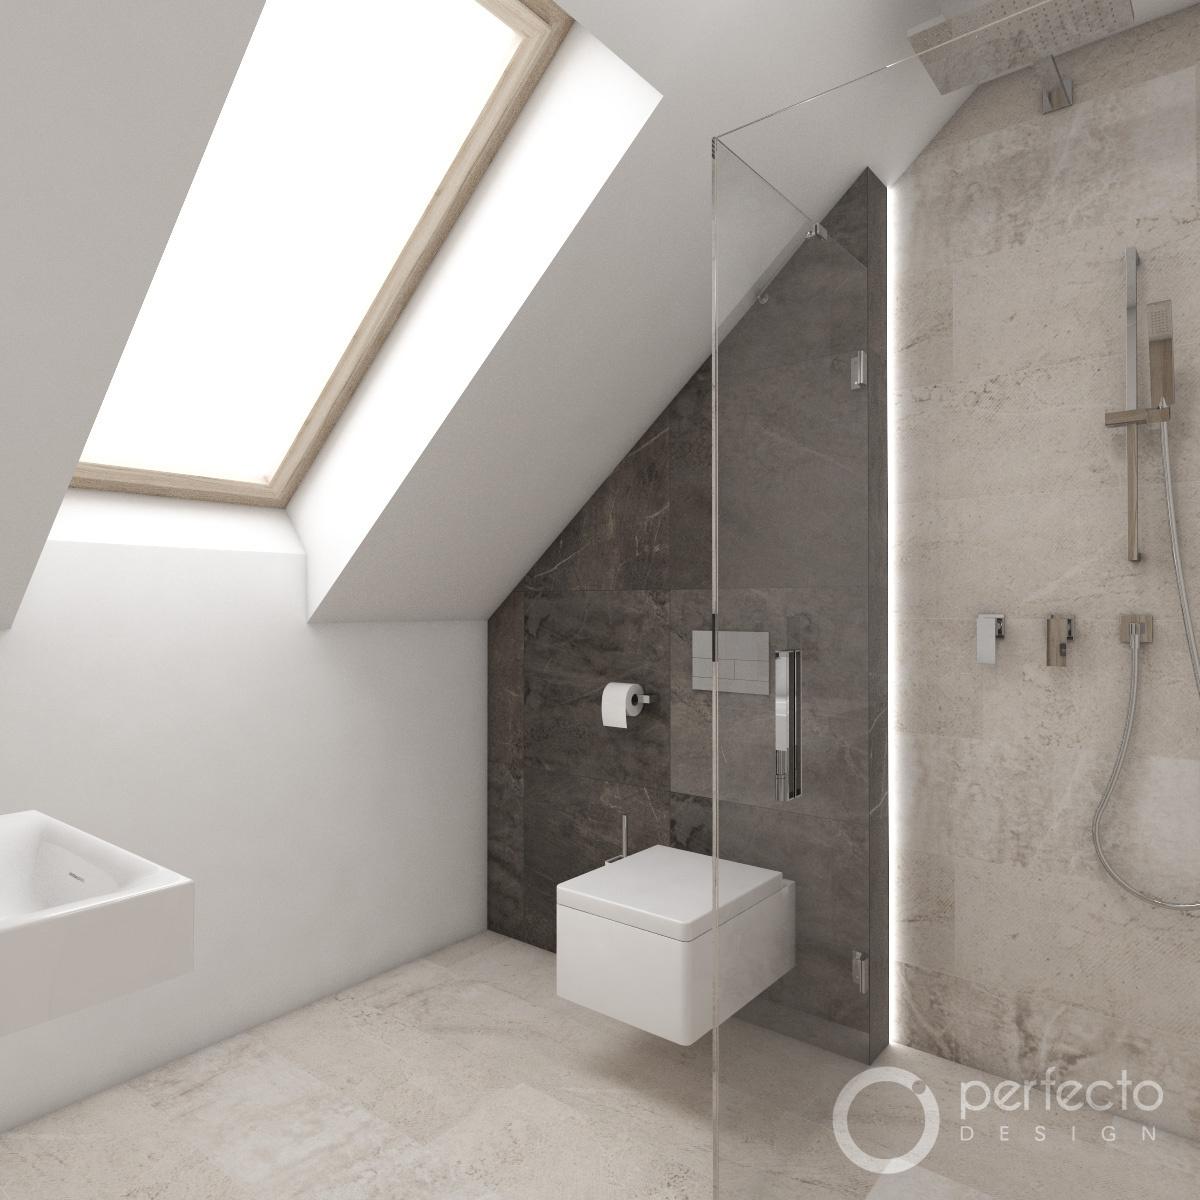 modernes badezimmer aria perfecto design. Black Bedroom Furniture Sets. Home Design Ideas